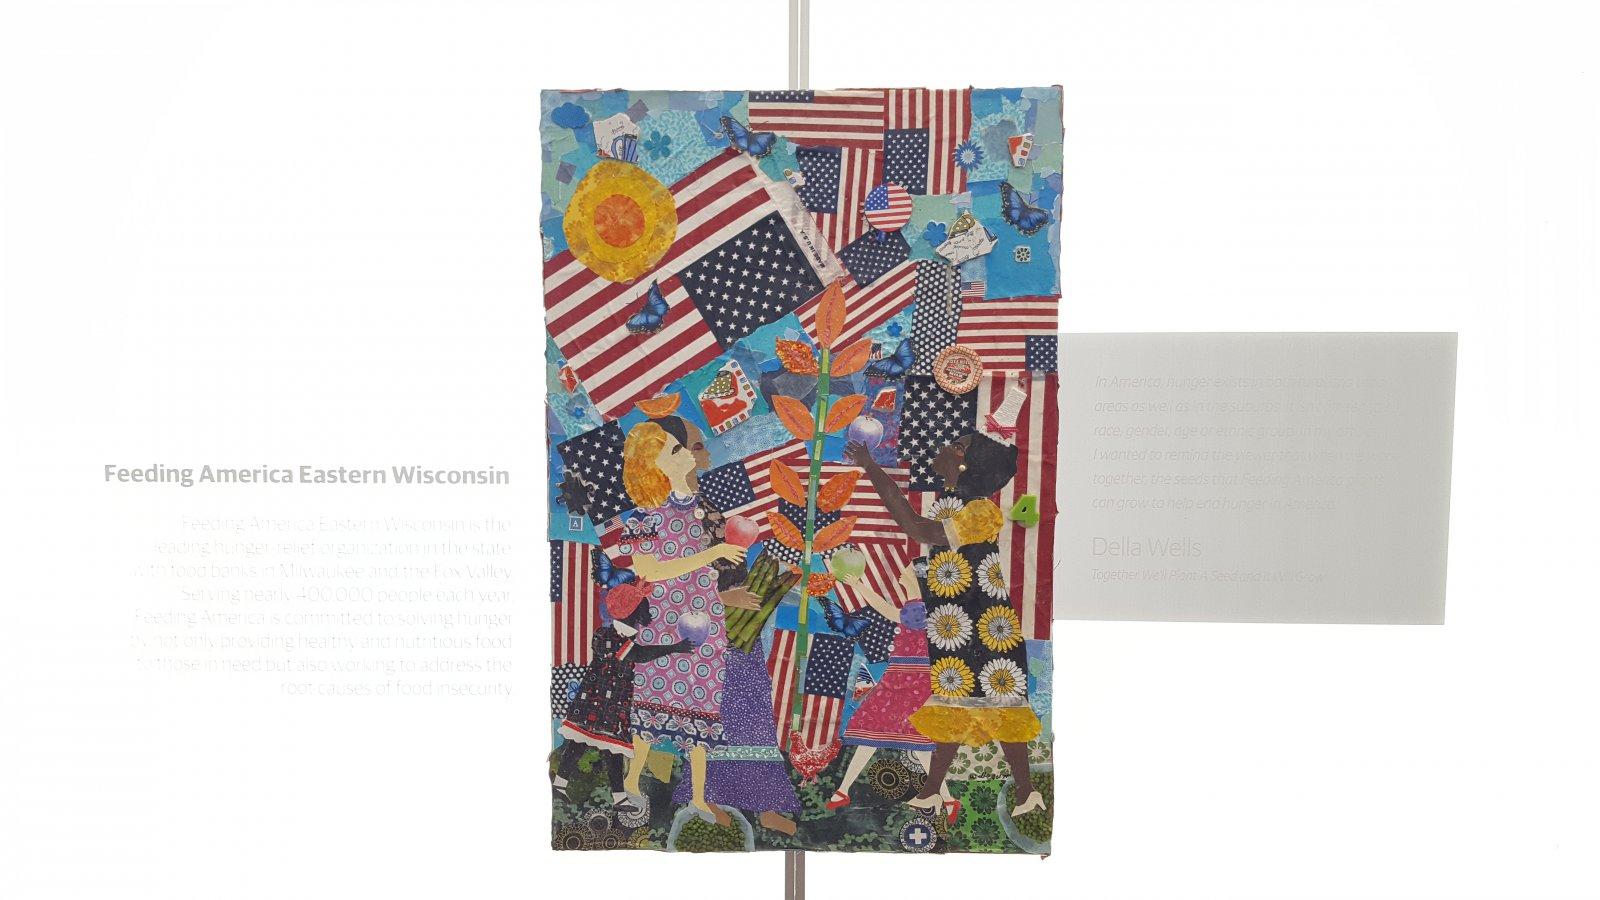 Tribute to Feeding America by Della Wells